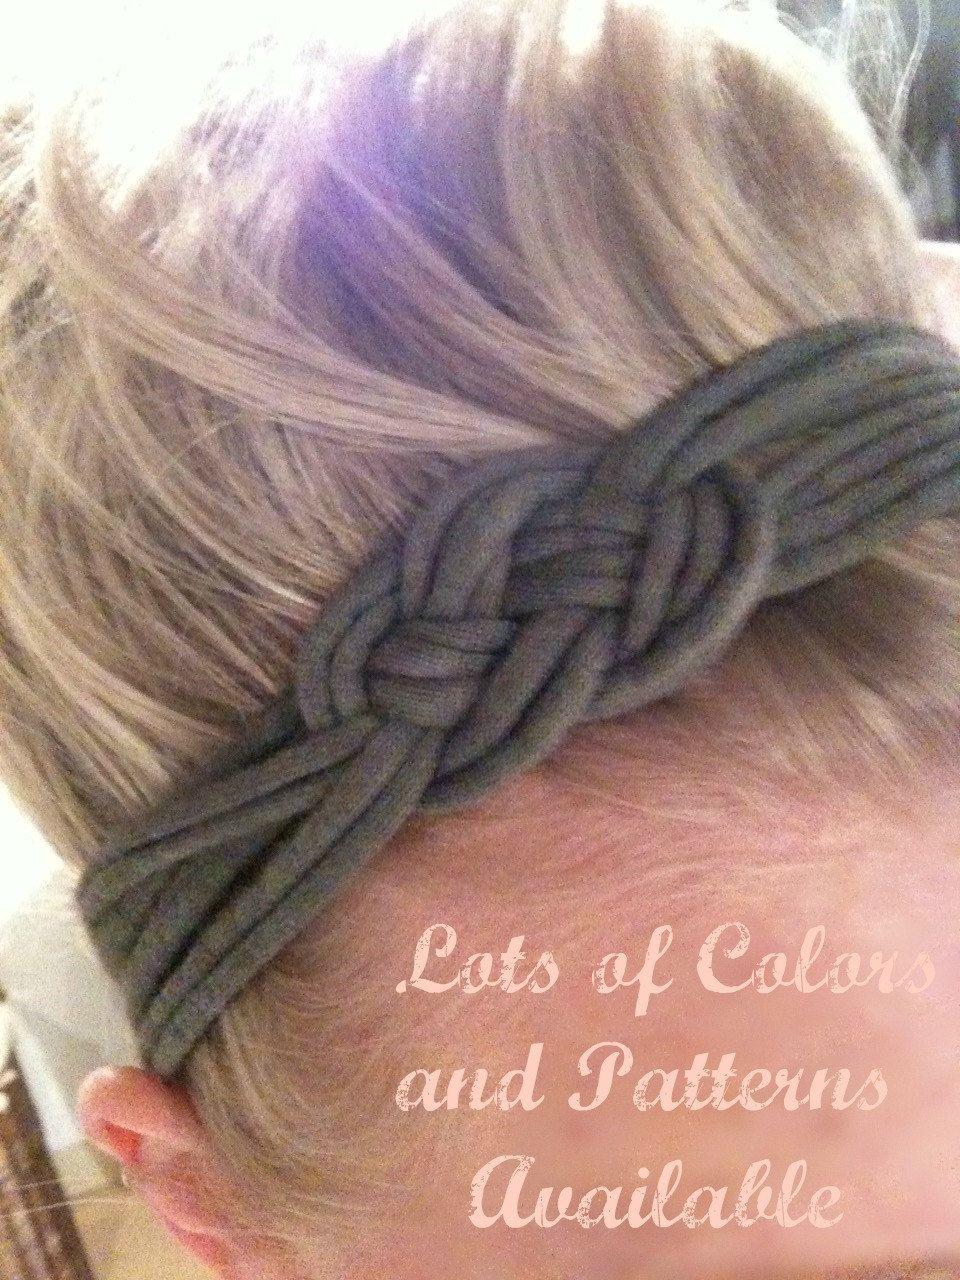 T-shirt Sailor Knot Headbands